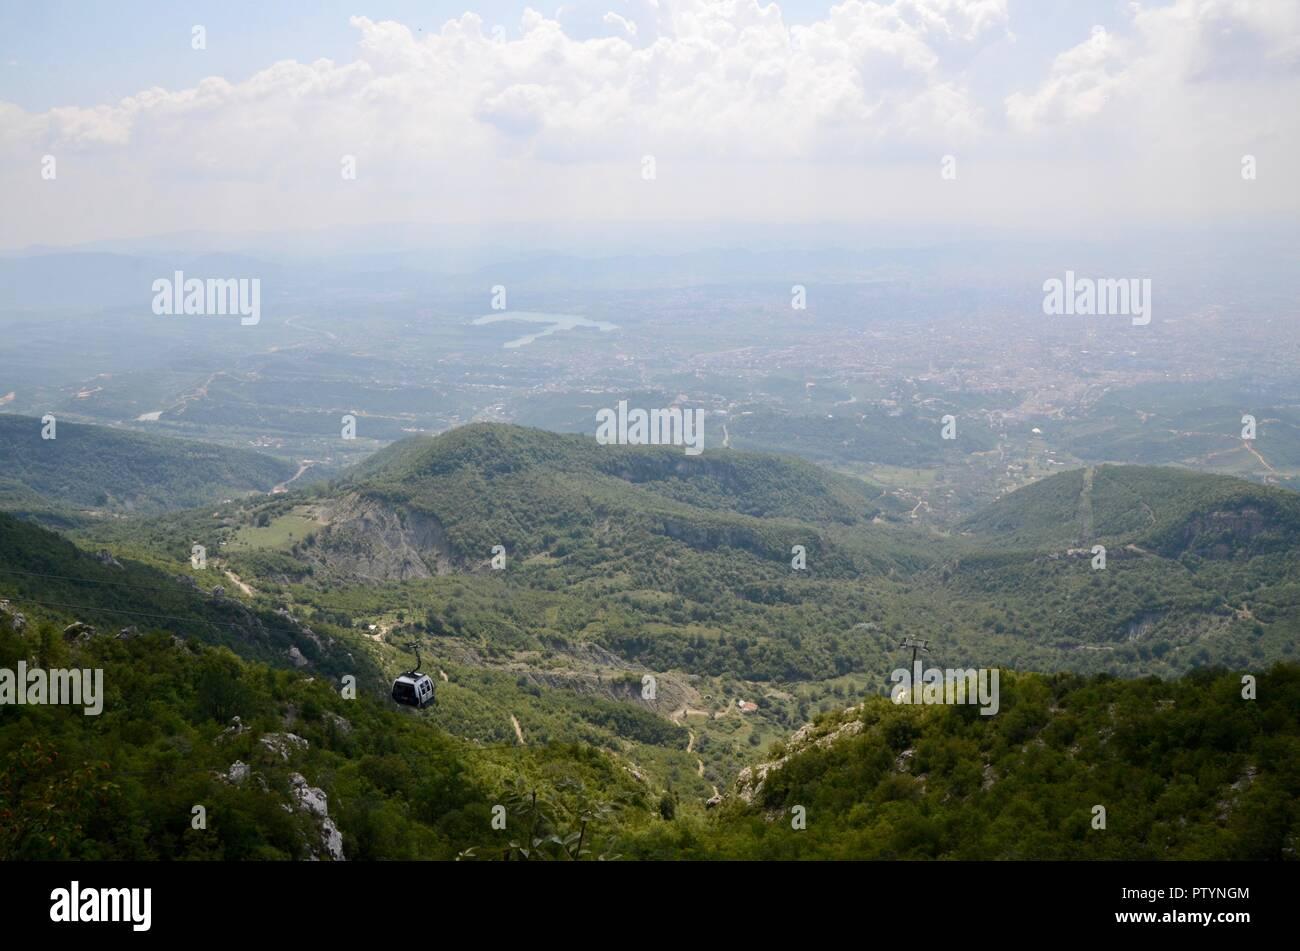 djati express cable car offers amazing views of tirana albania - Stock Image